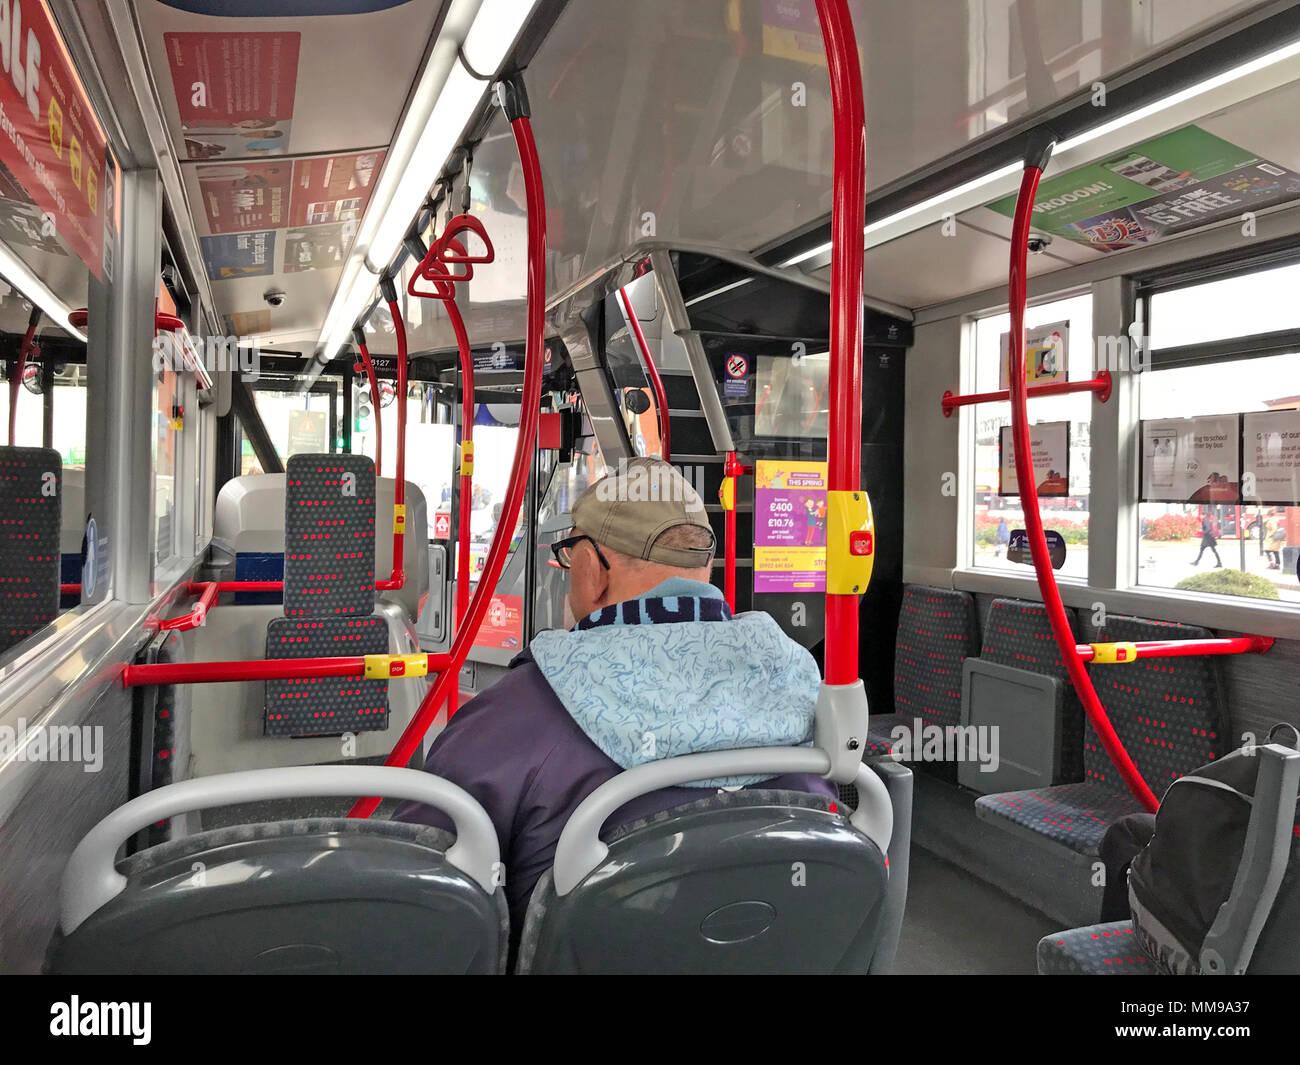 GoTonysmith,@HotpixUK,NXbus50,NX,bus,50,inside,interior,seat,seats,transport,buses,Birmingham,England,UK,Interior,of,the,50